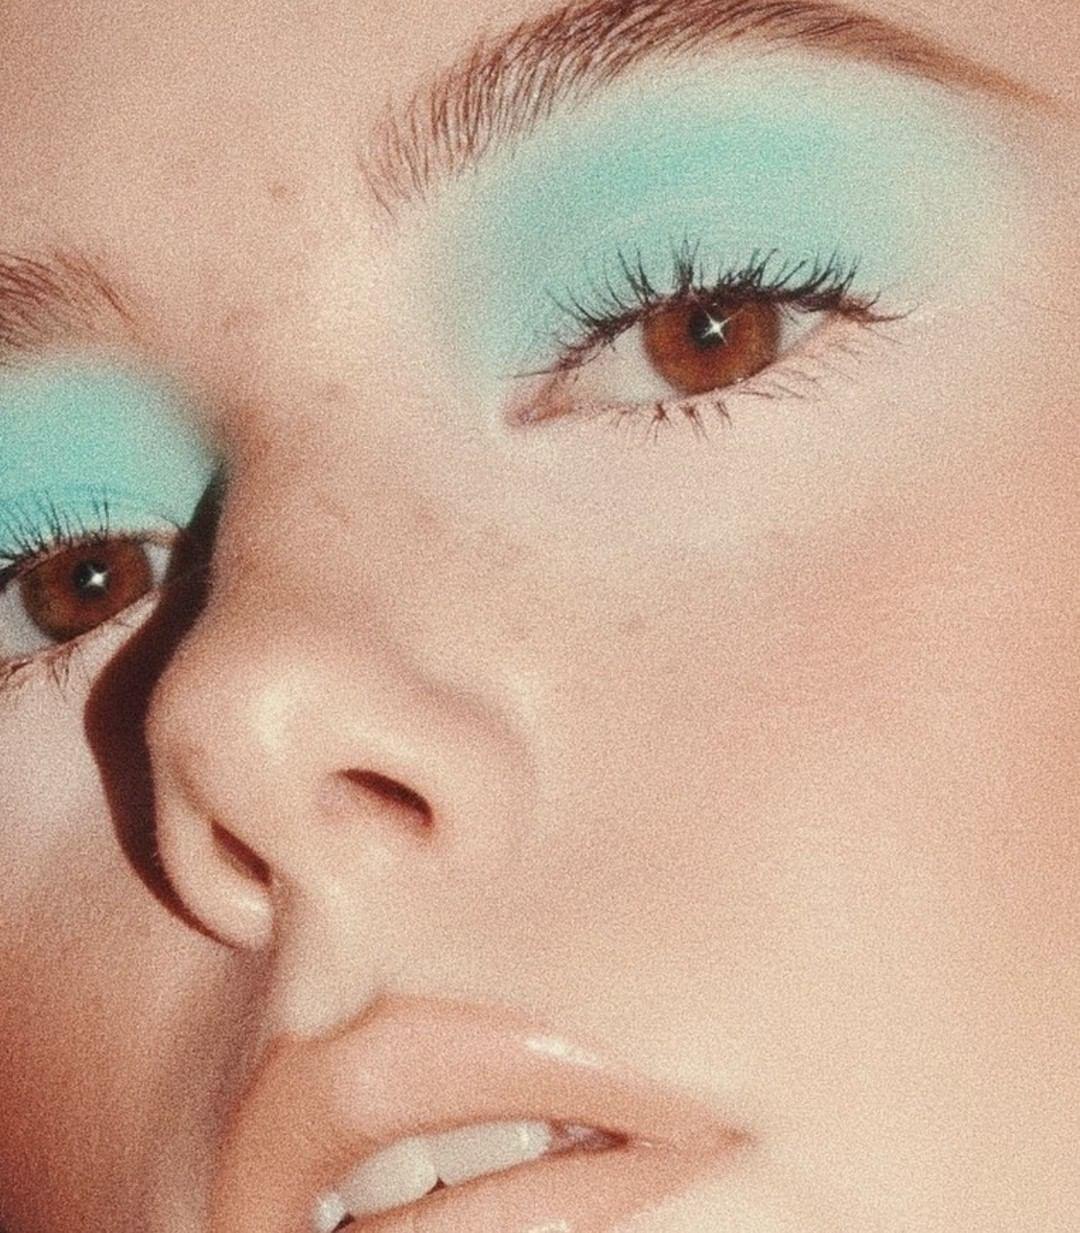 Pin By Chris On Makeup Eyeshadow 70s Makeup Funky Makeup